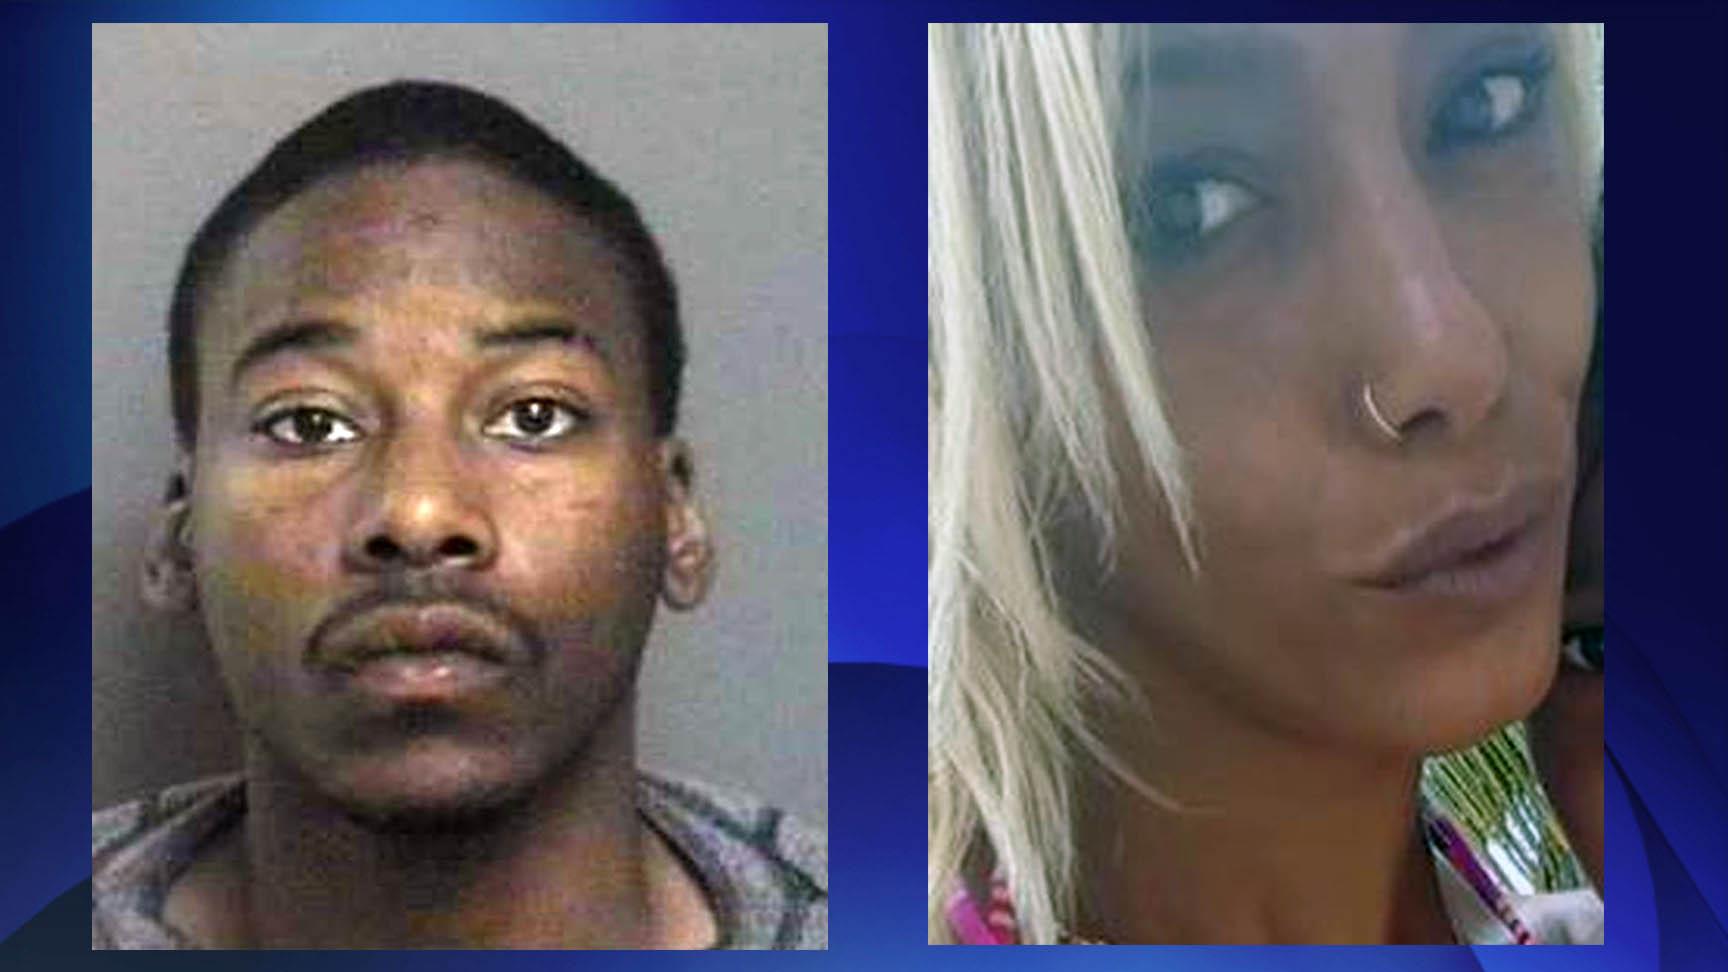 Trevor Smithen and Rasha Al-Enzi were arrested on Sept. 5, 2016. HANDOUT/Toronto  Police Service